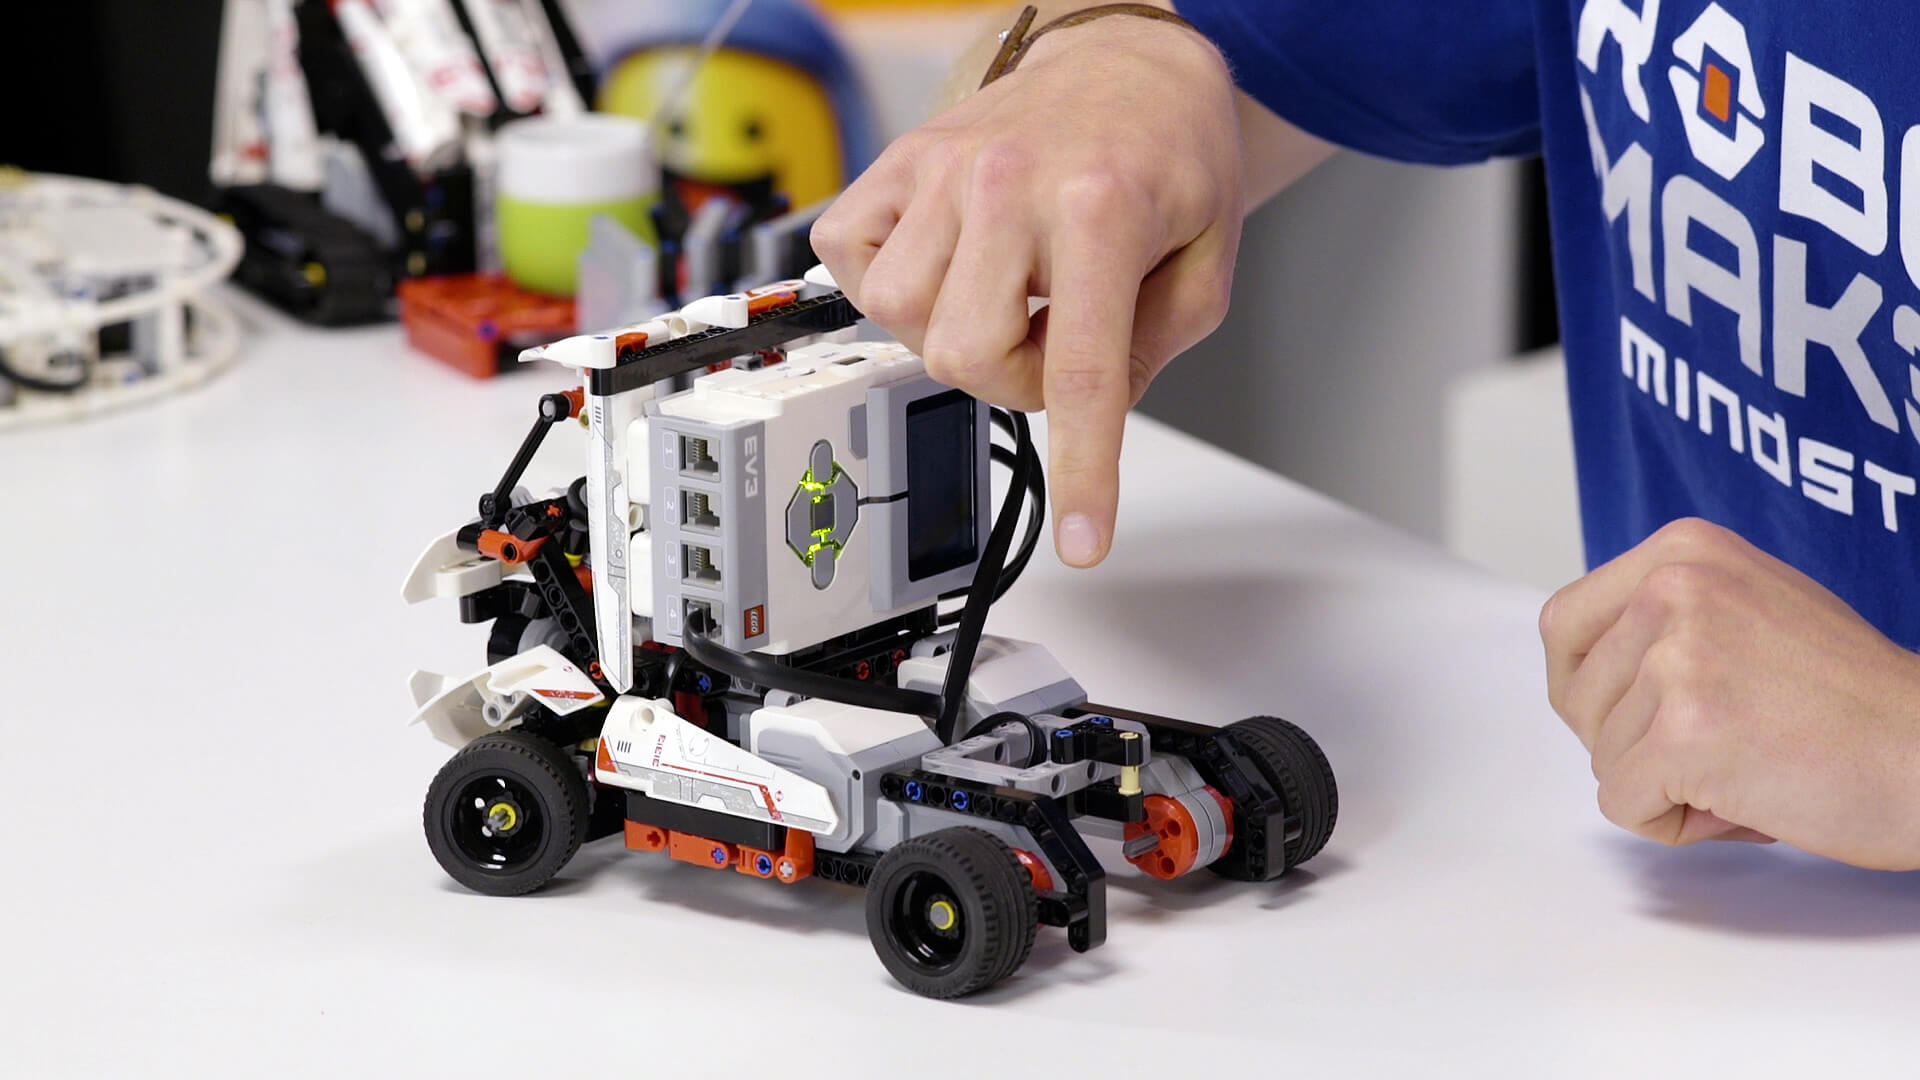 lego-robotics-charvik-academy   Charvik Academy LLP ,